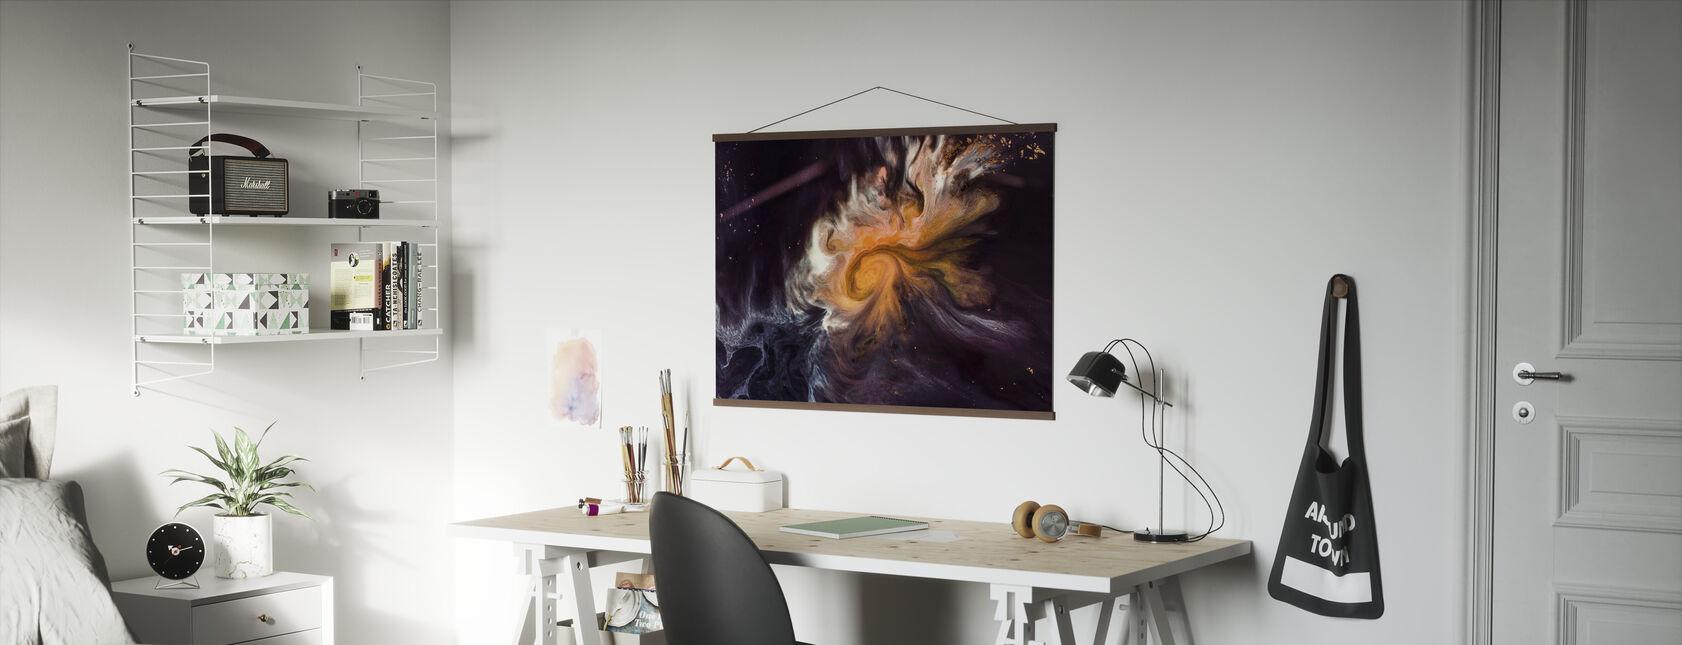 Kosmiczna historia - Plakat - Biuro